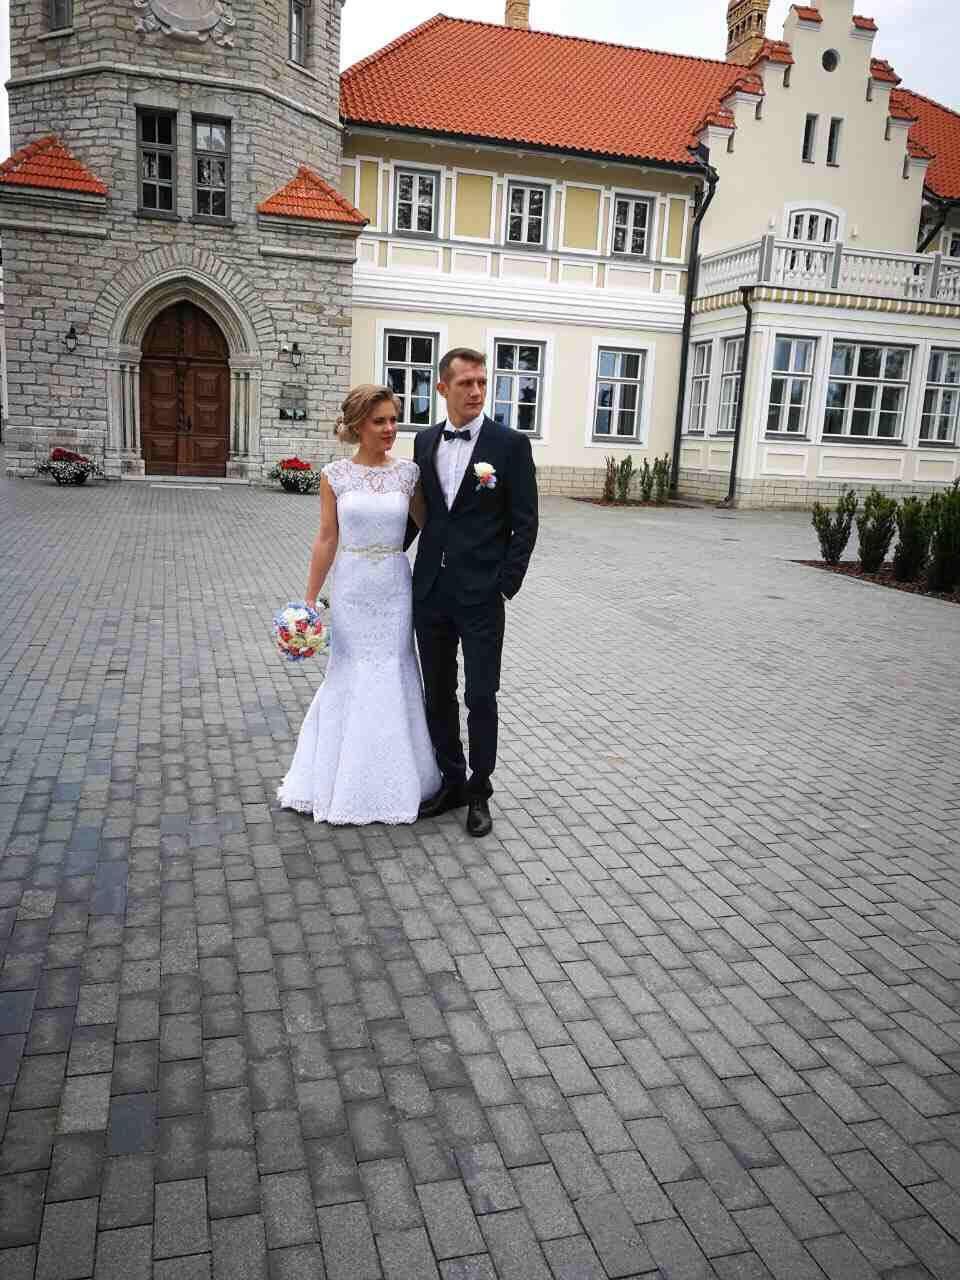 Wedding Day of Yelena